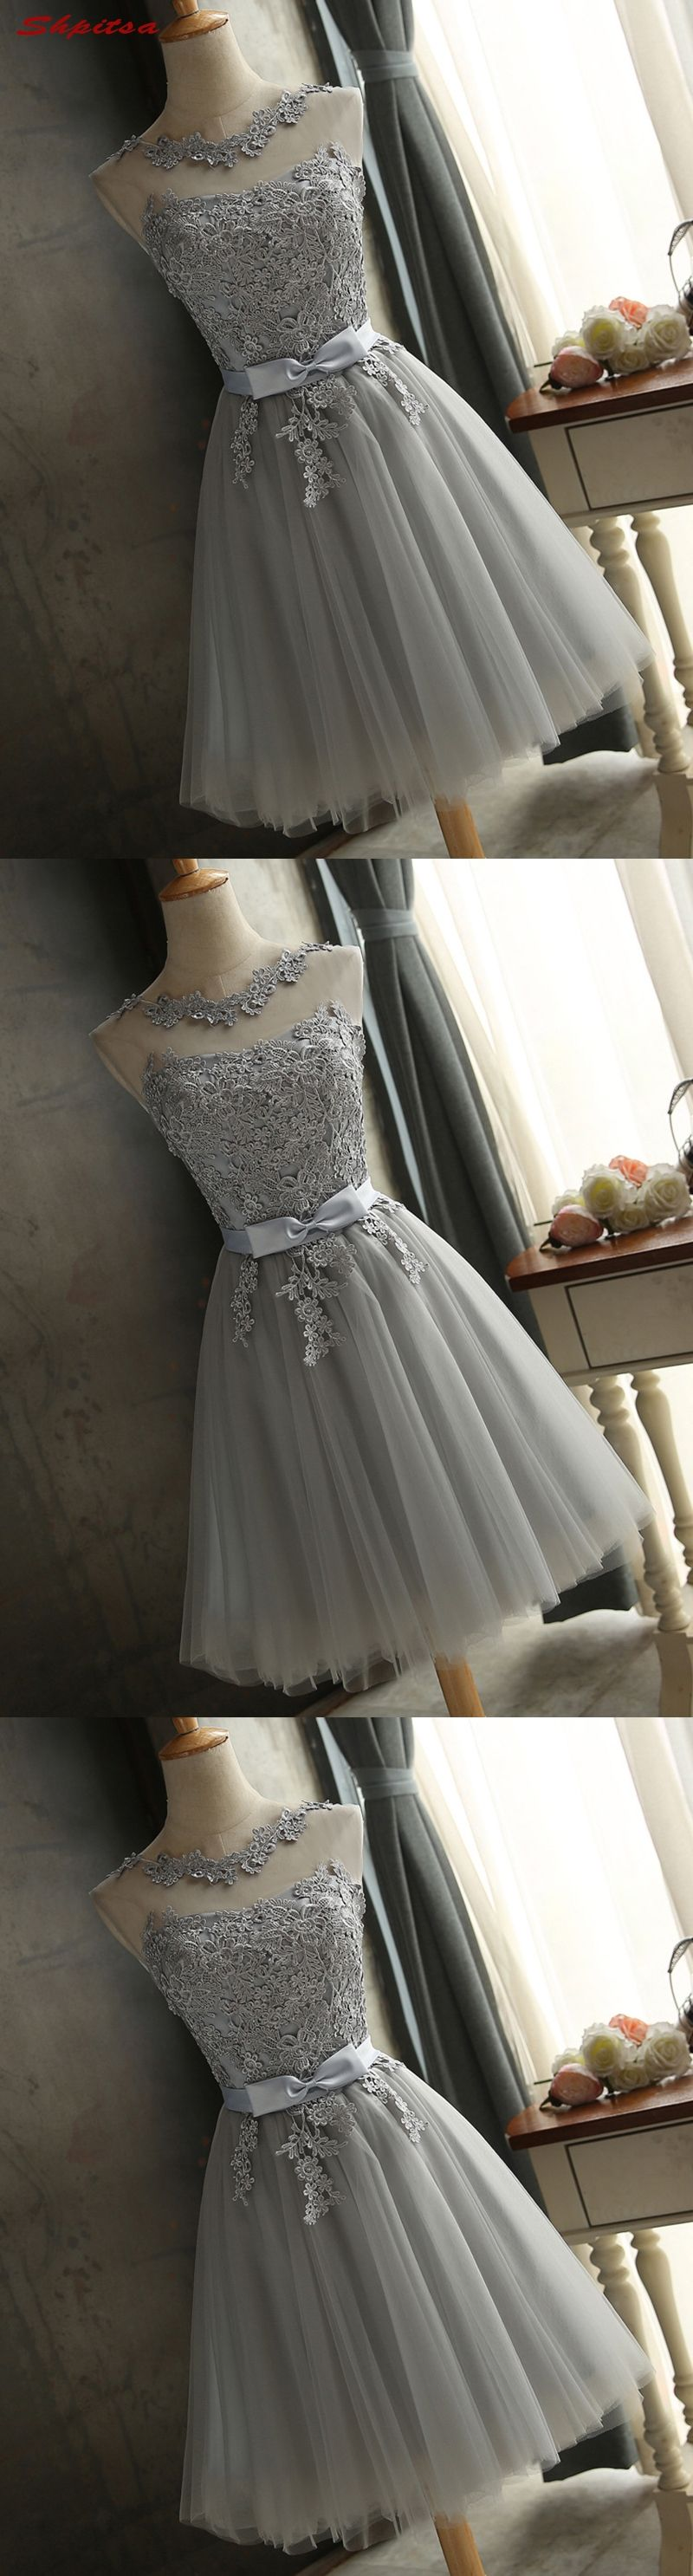 9b7bd91872 Silver Gray Short Homecoming Dresses 8th Grade Prom Dresses Junior High  Cute Graduation Formal Dresses mezuniyet elbiseleri